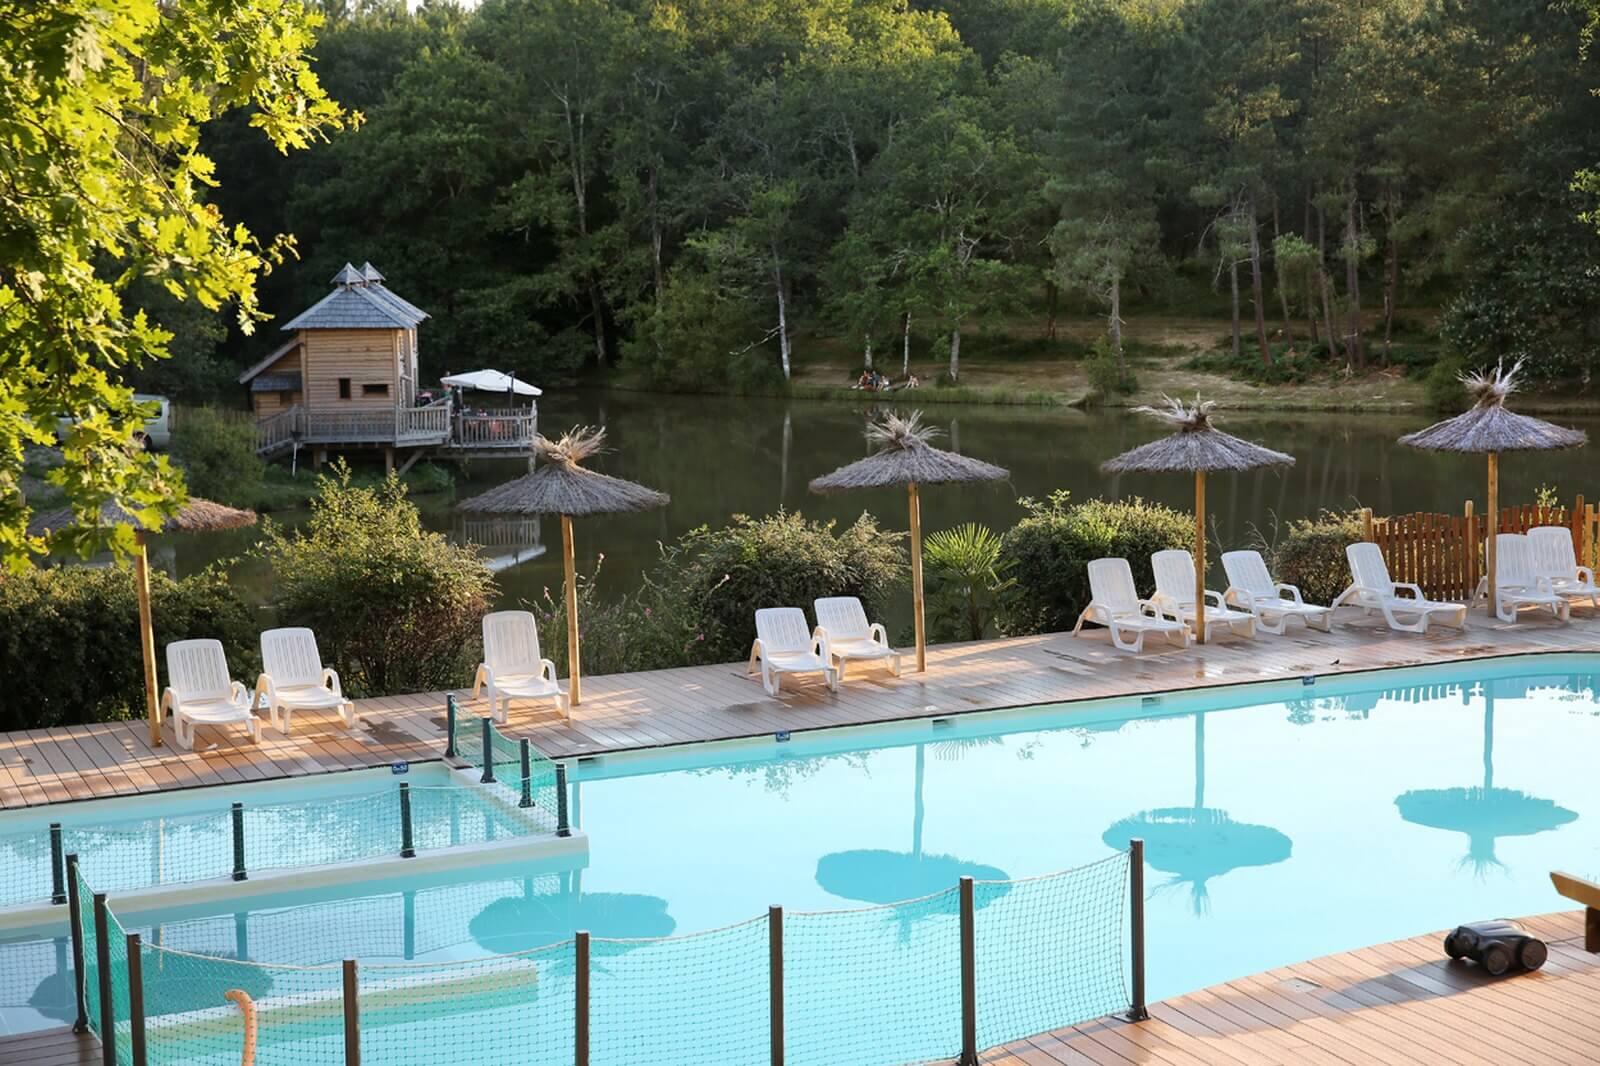 Dordogne Camping Campsite Swimming Pool - Etang De Bazange**** avec Horaire Piscine Bergerac